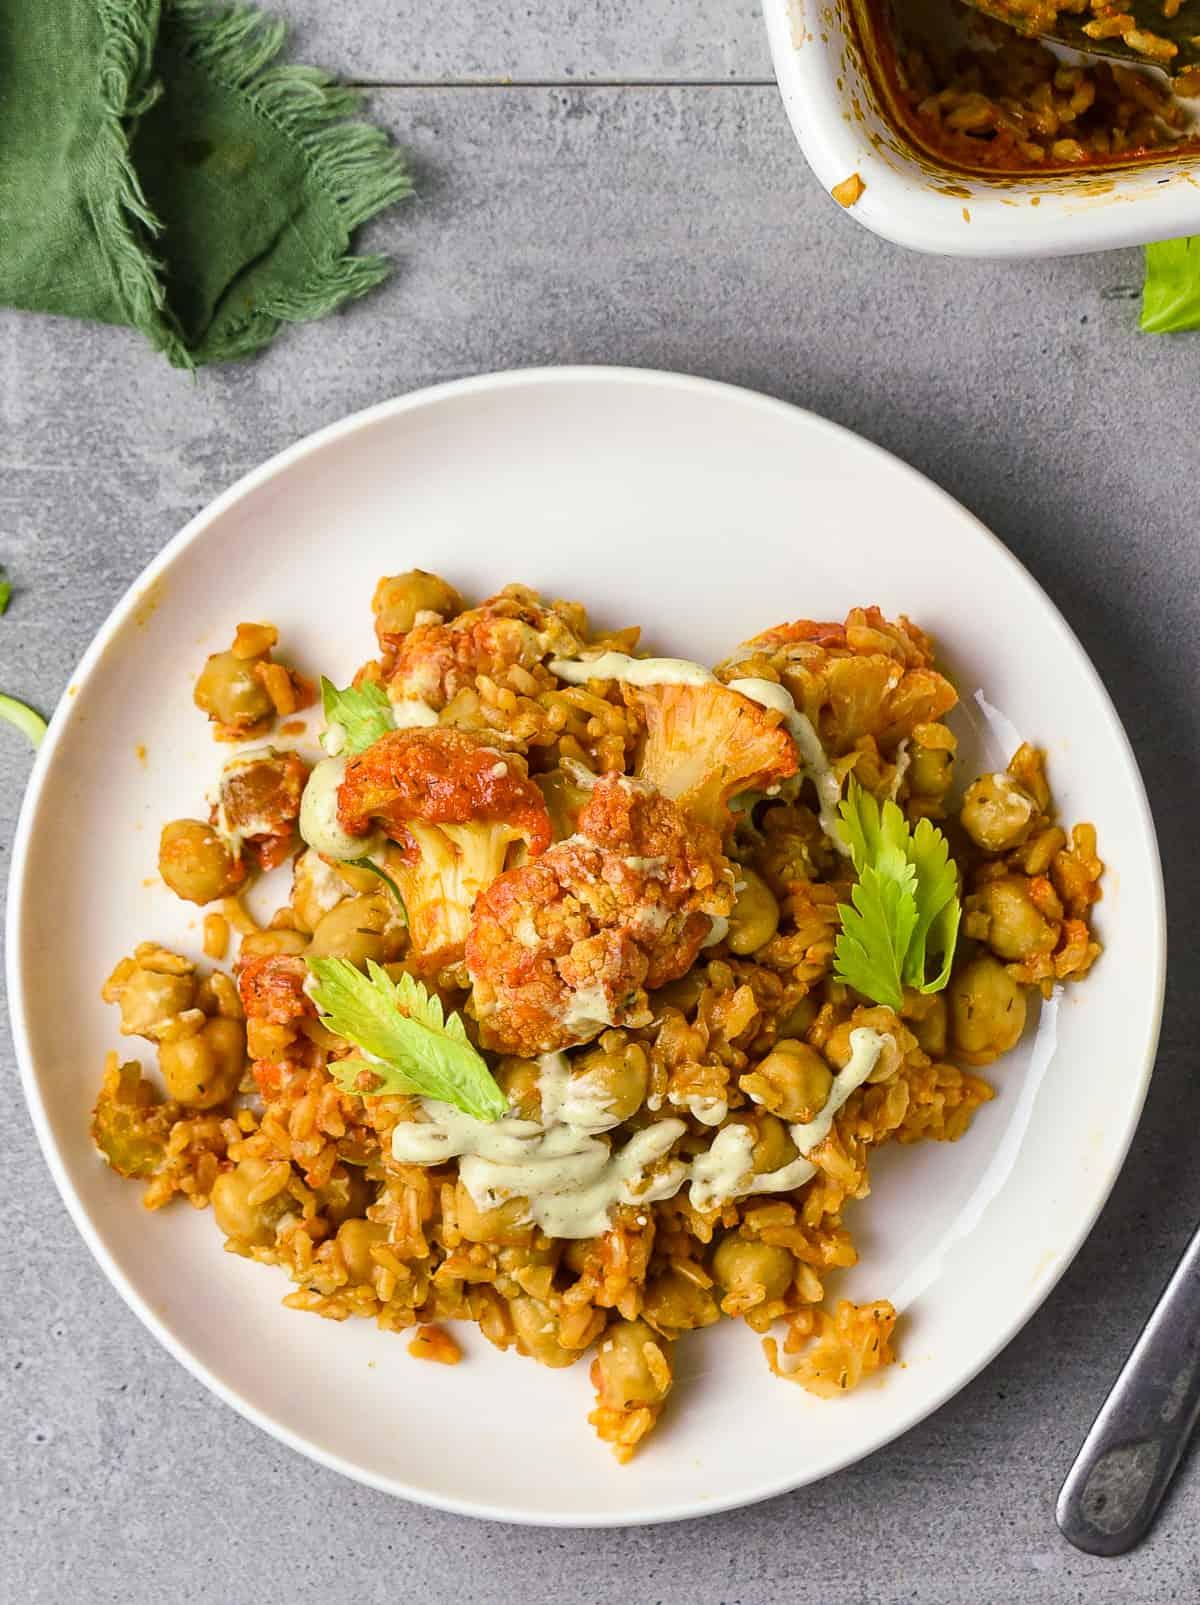 Buffalo chickpea cauliflower casserole on plate.